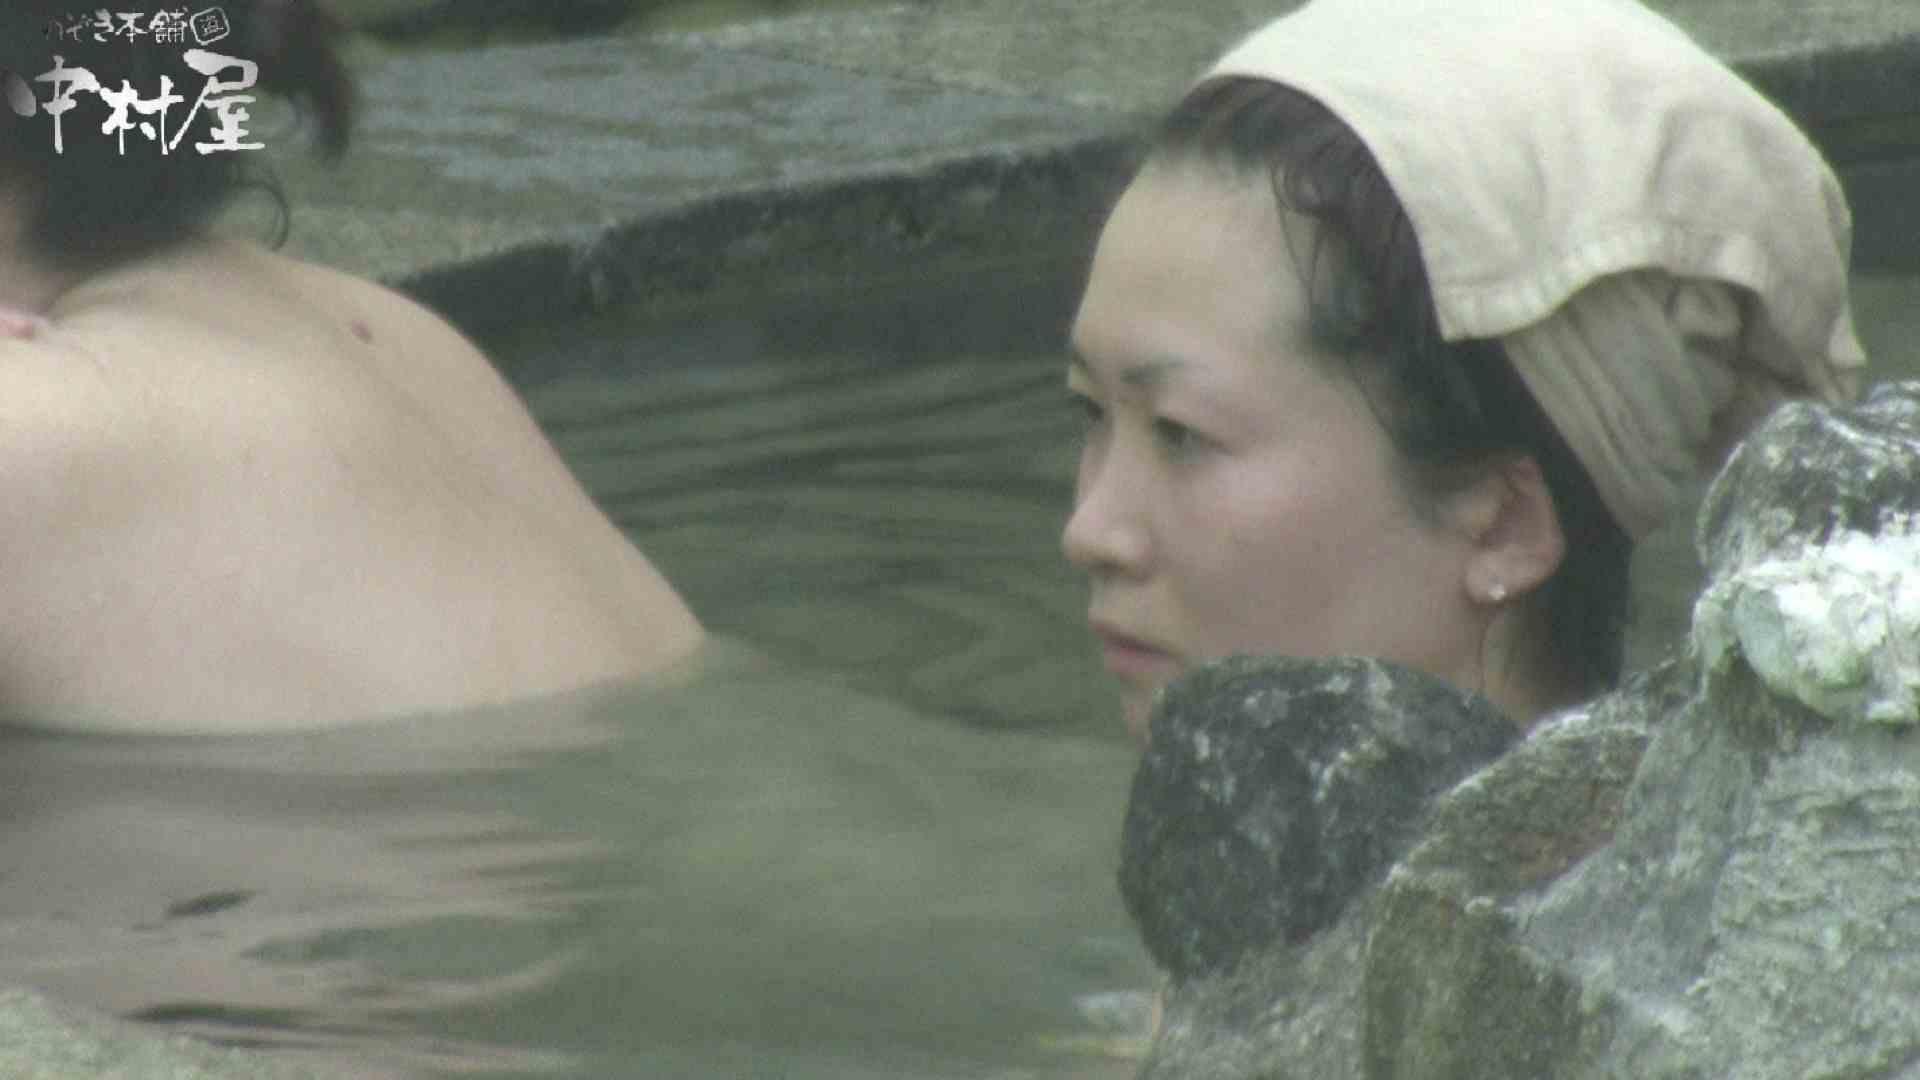 Aquaな露天風呂Vol.906 露天風呂編  86PIX 76